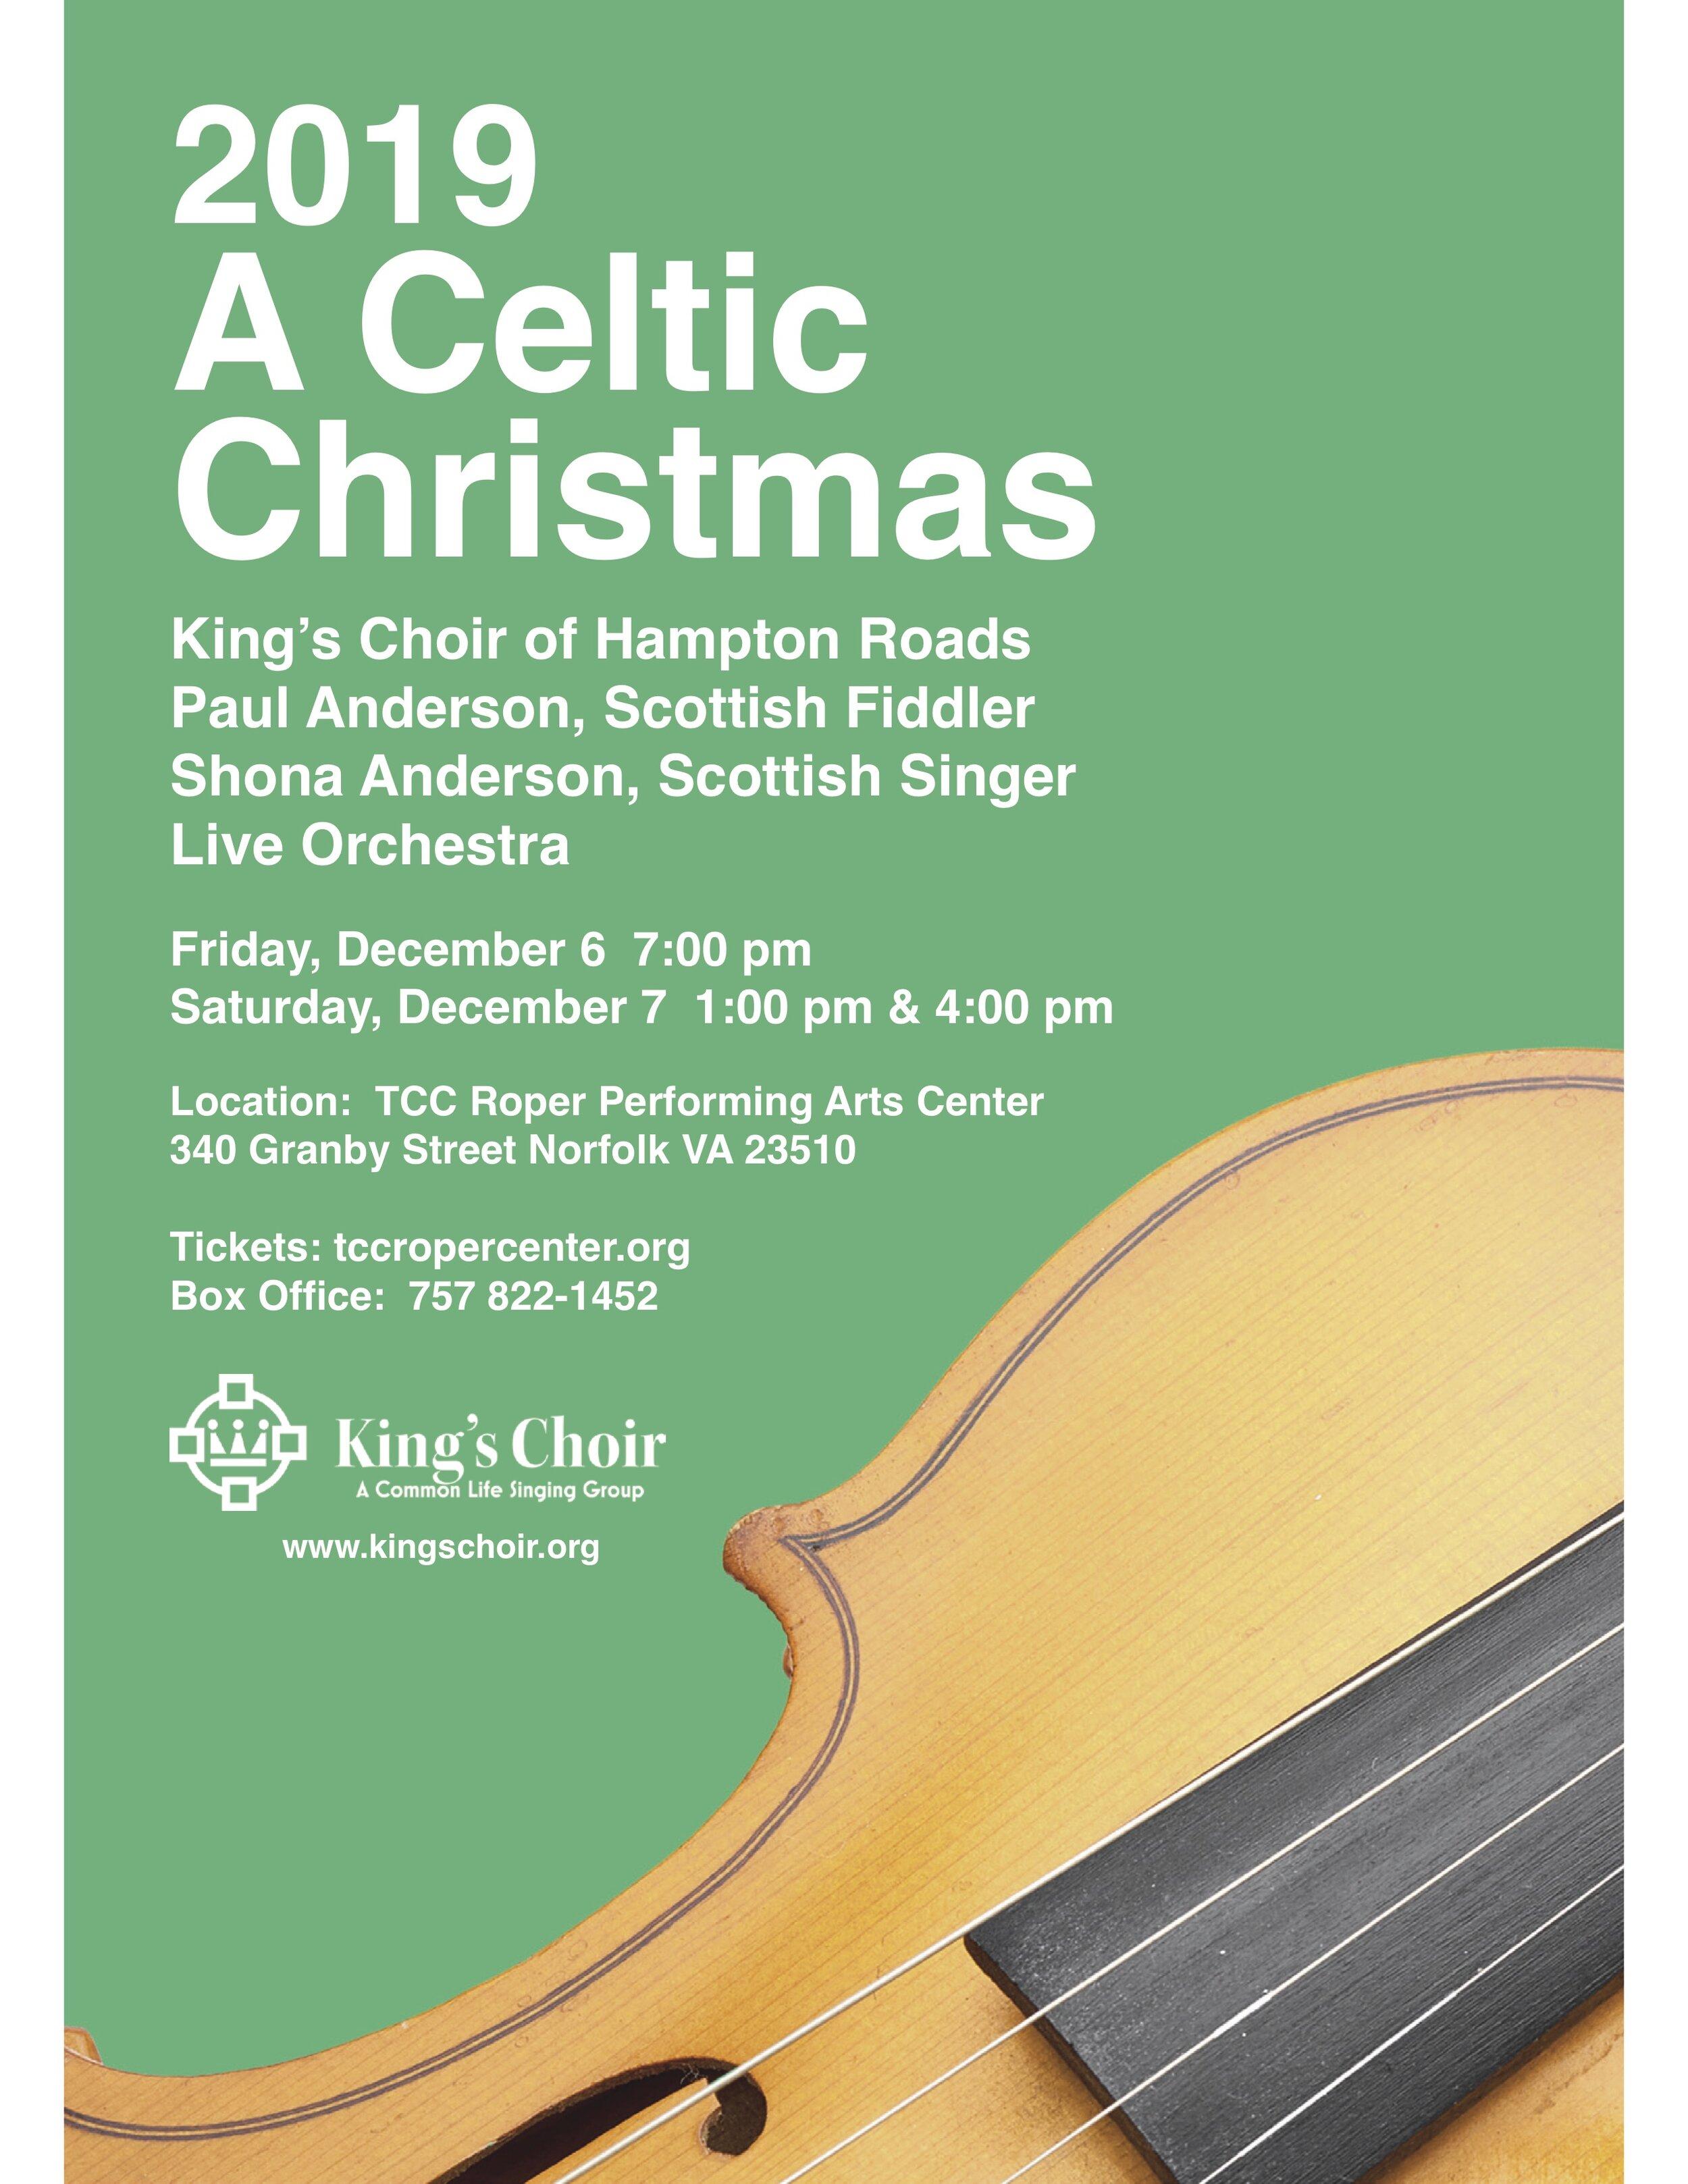 Saturday, December 7 @ 1:00 pm  TCC Roper Performing Arts Center  340 Granby Street Norfolk 23510  tccropercenter.org/757.822.1452 Box Office